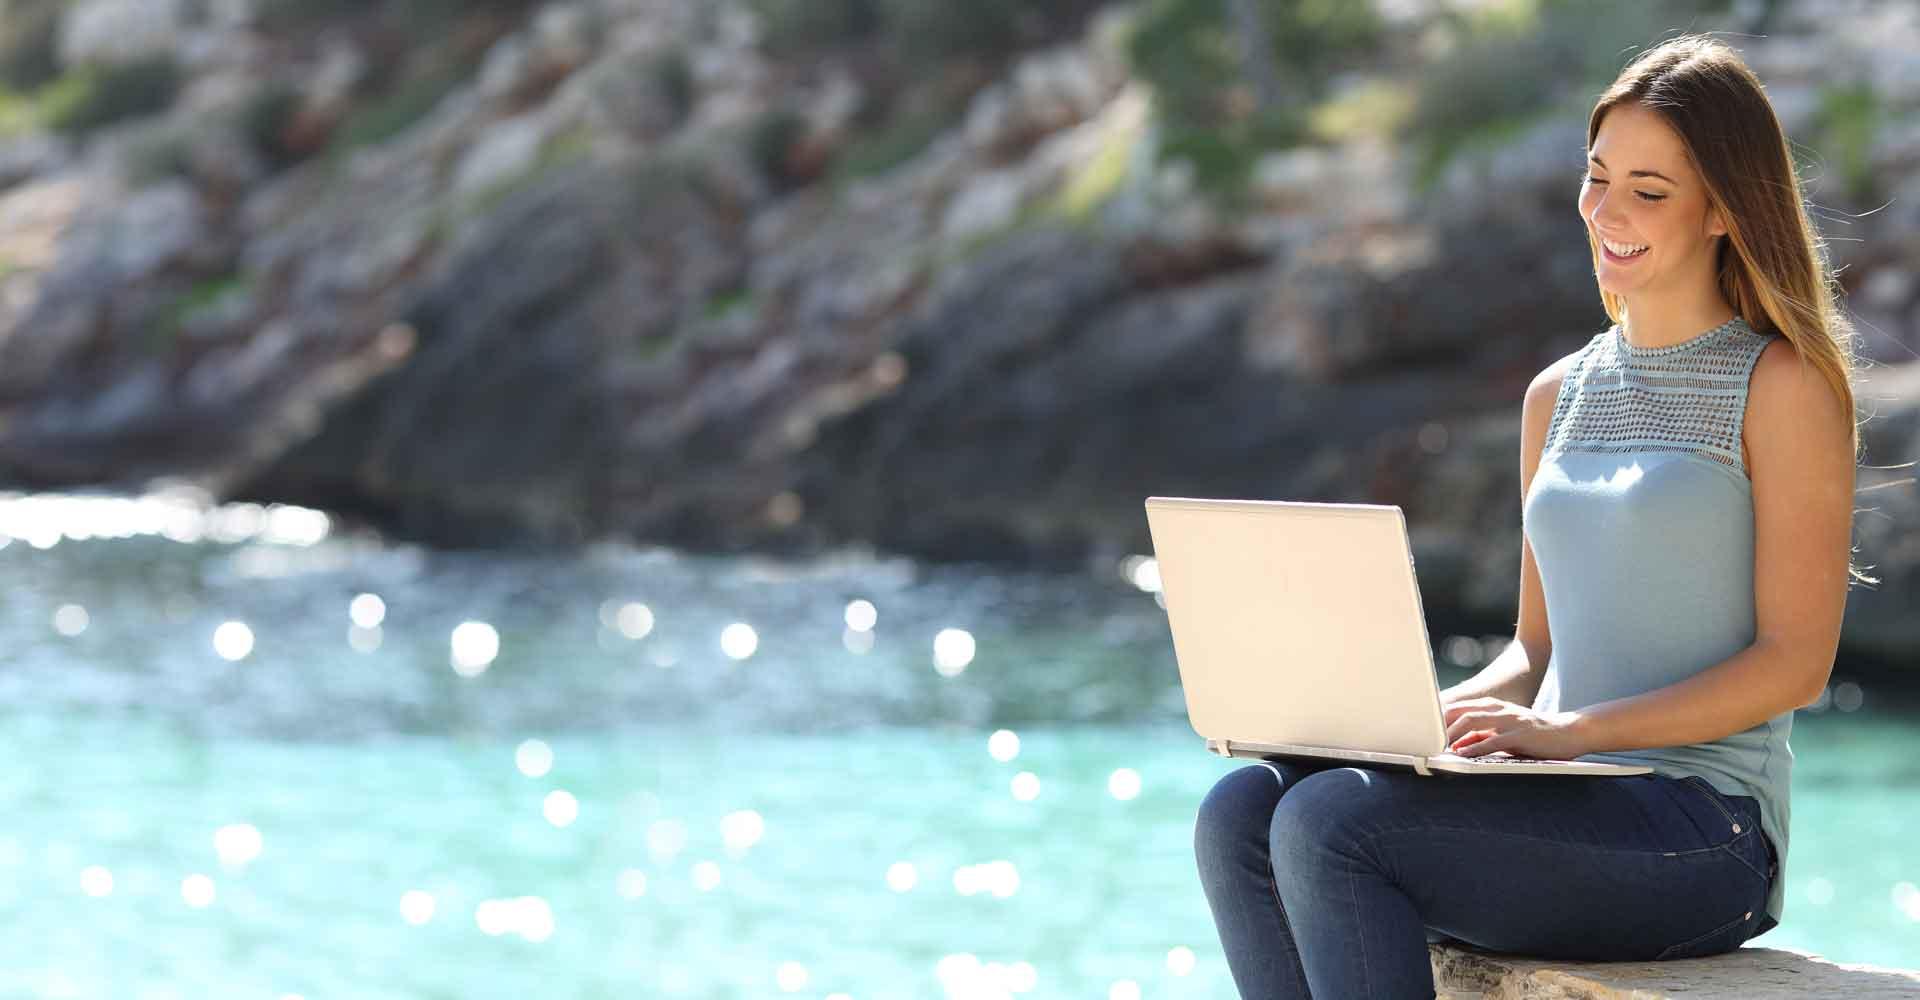 Become a Complete Web Developer